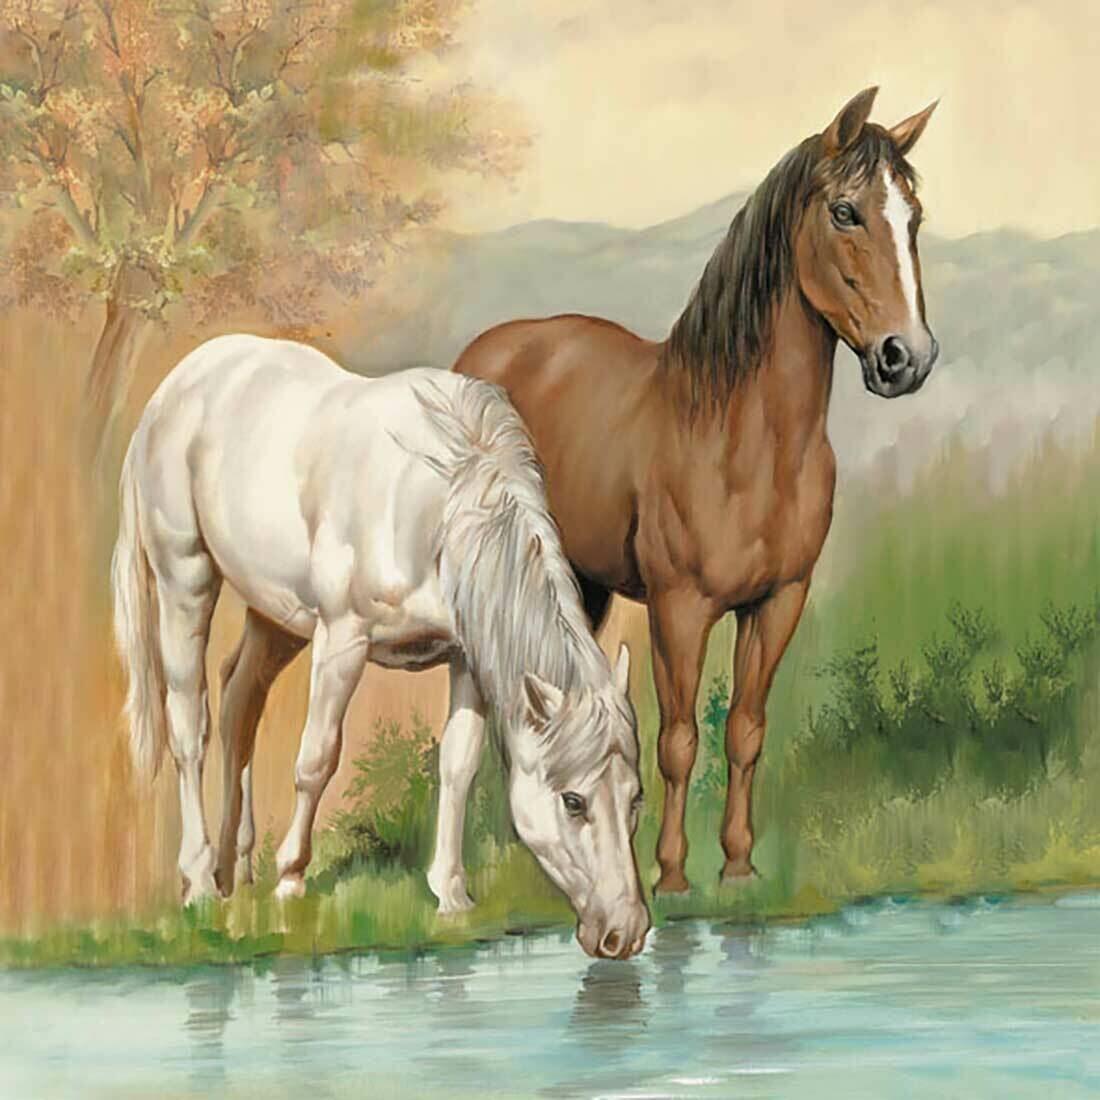 Decoupage Paper Napkins - Horses - 13x13 - (1 Sheet)